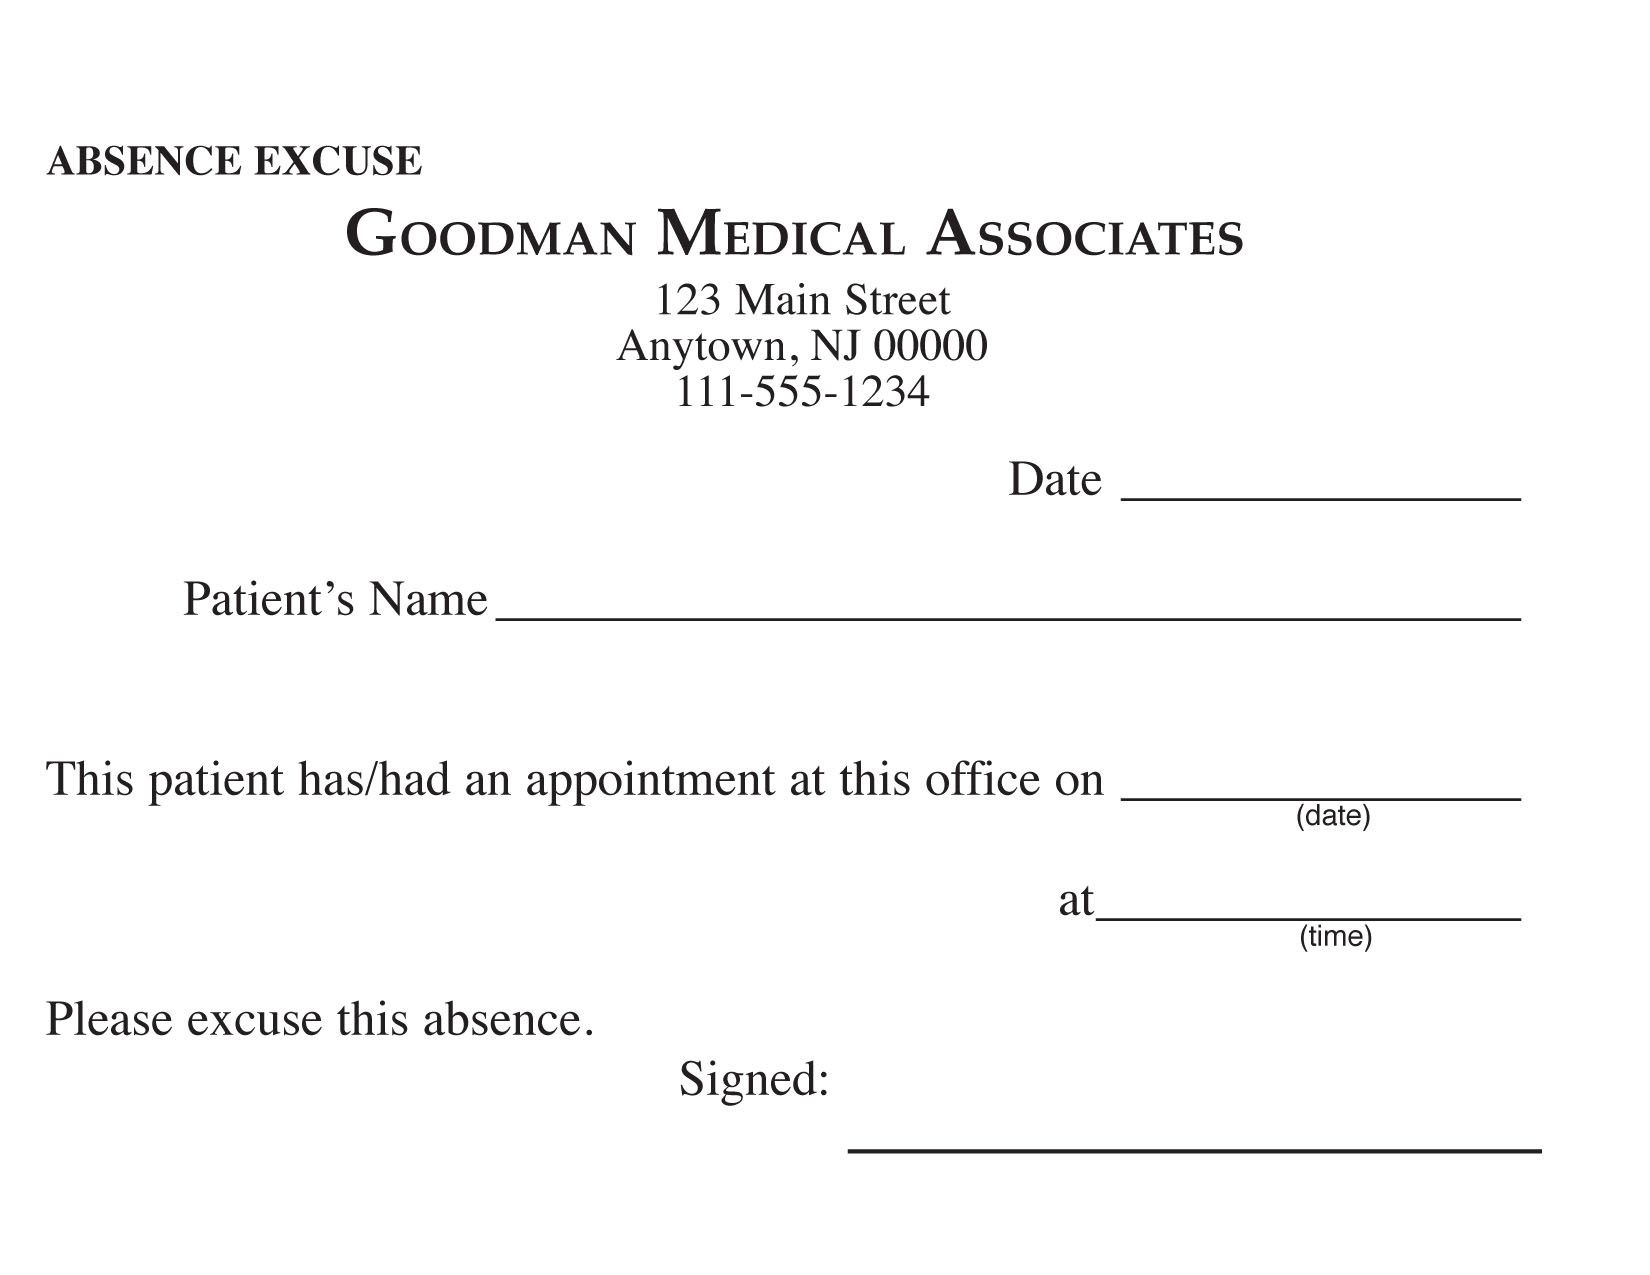 Blank Printable Doctor Excuse Form | Keskes Printing - Mds - Free Printable Doctors Note For Work